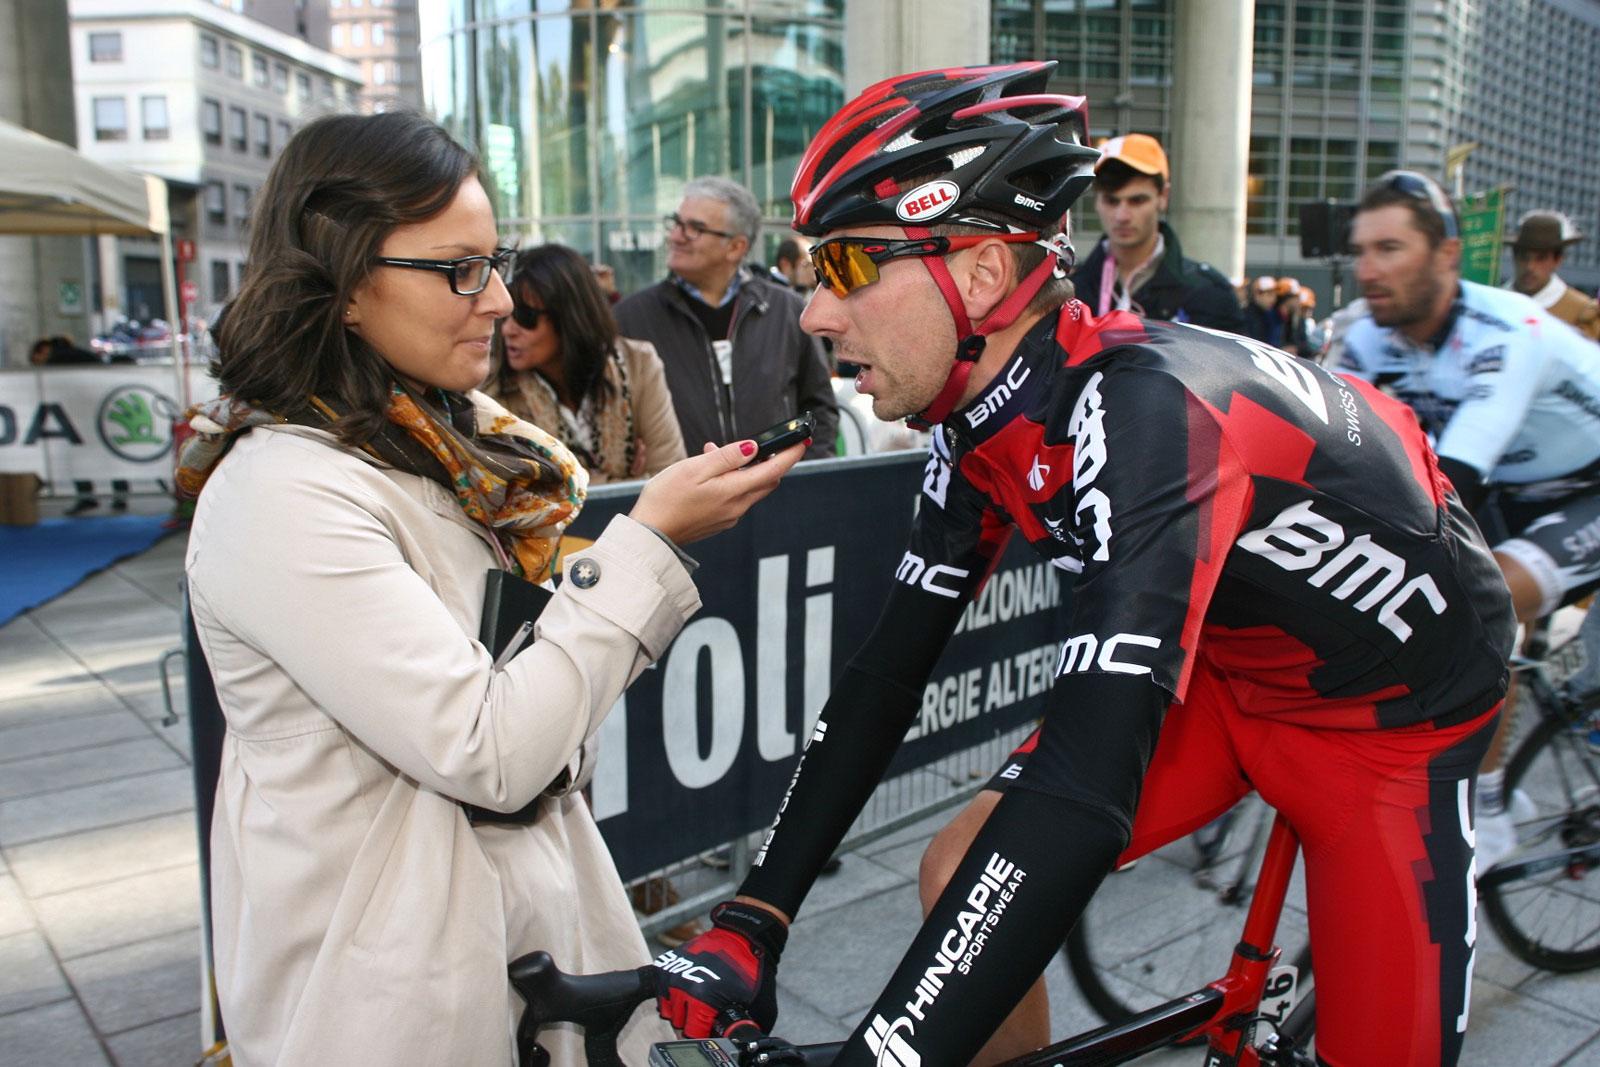 Giulia De Maio Ivan Santaromita Lombardia ciclismo